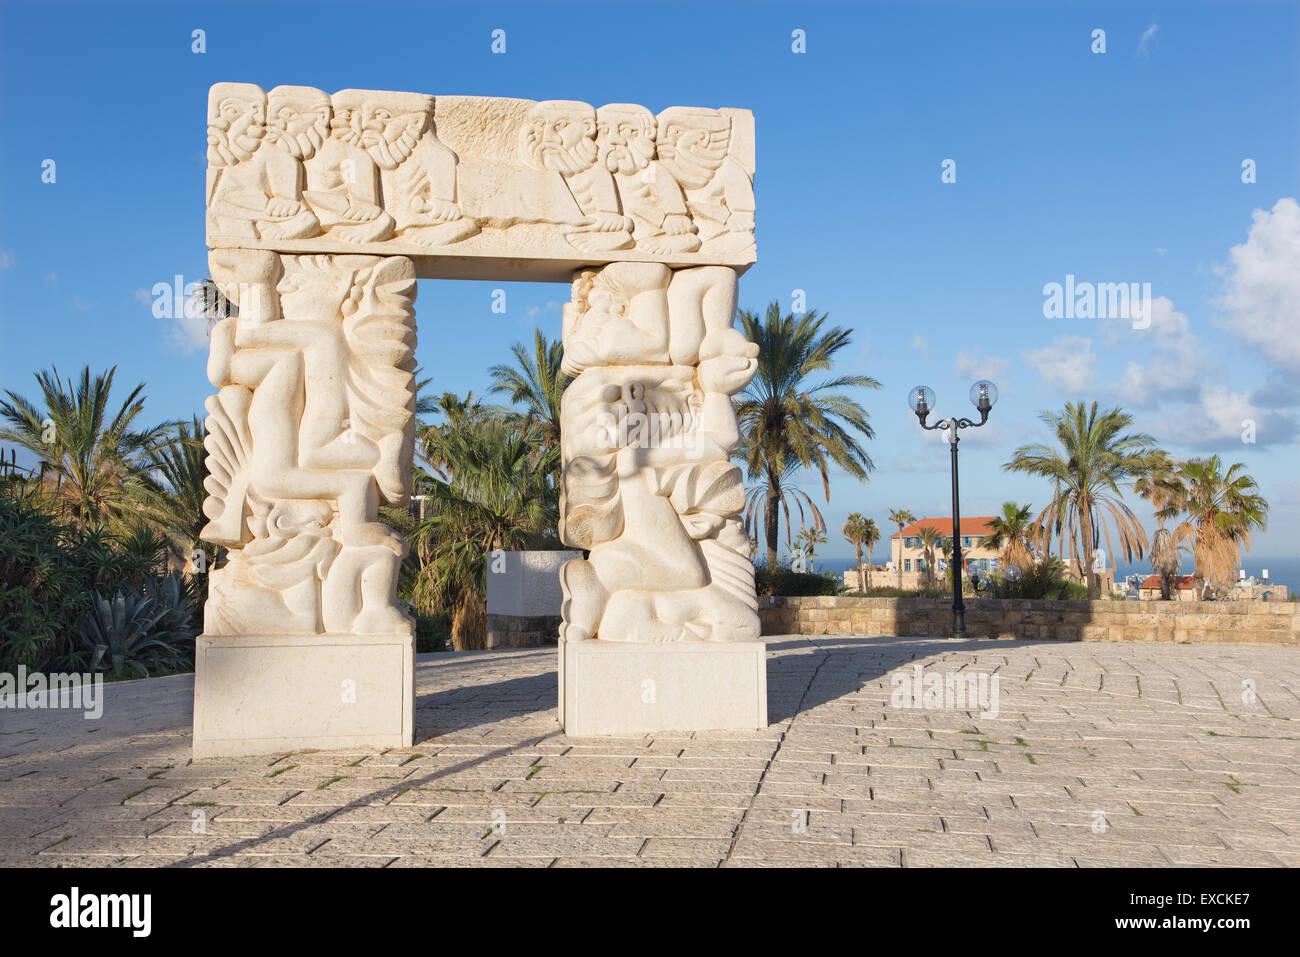 "TEL AVIV, ISRAEL - MARCH 2, 2015: The modern contemporary sculpture 'Statue of Faith"" in Gan HaPisga Summit - Stock Image"